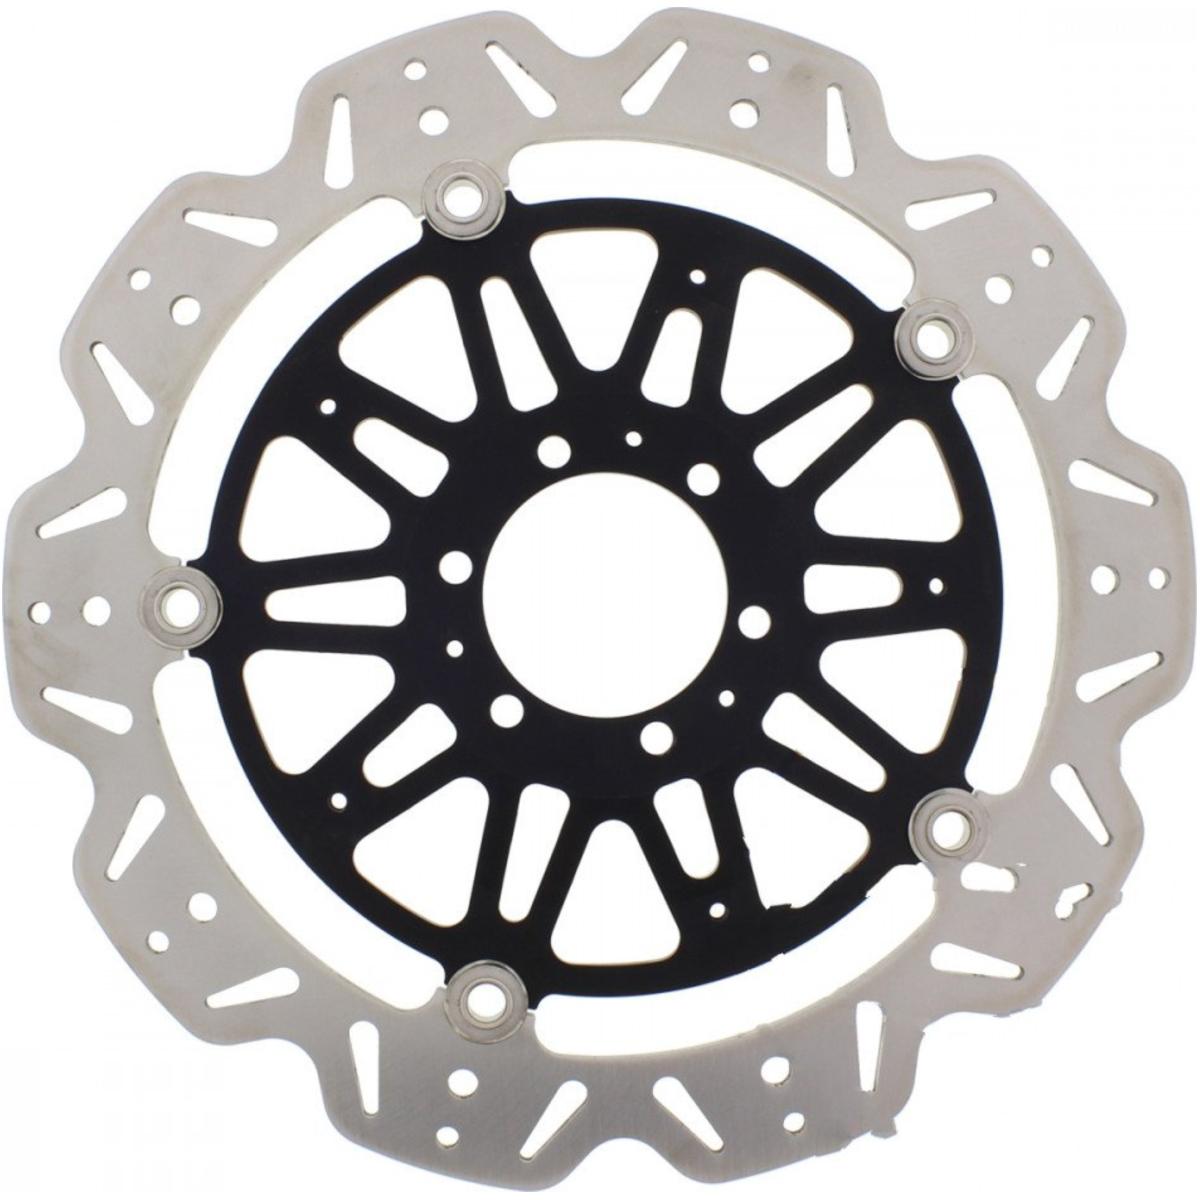 Front Disc Brake Rotor Kawasaki Bayou 300 /& 400 4x4 Prairie 300 /& 400 2x4 /& 4x4